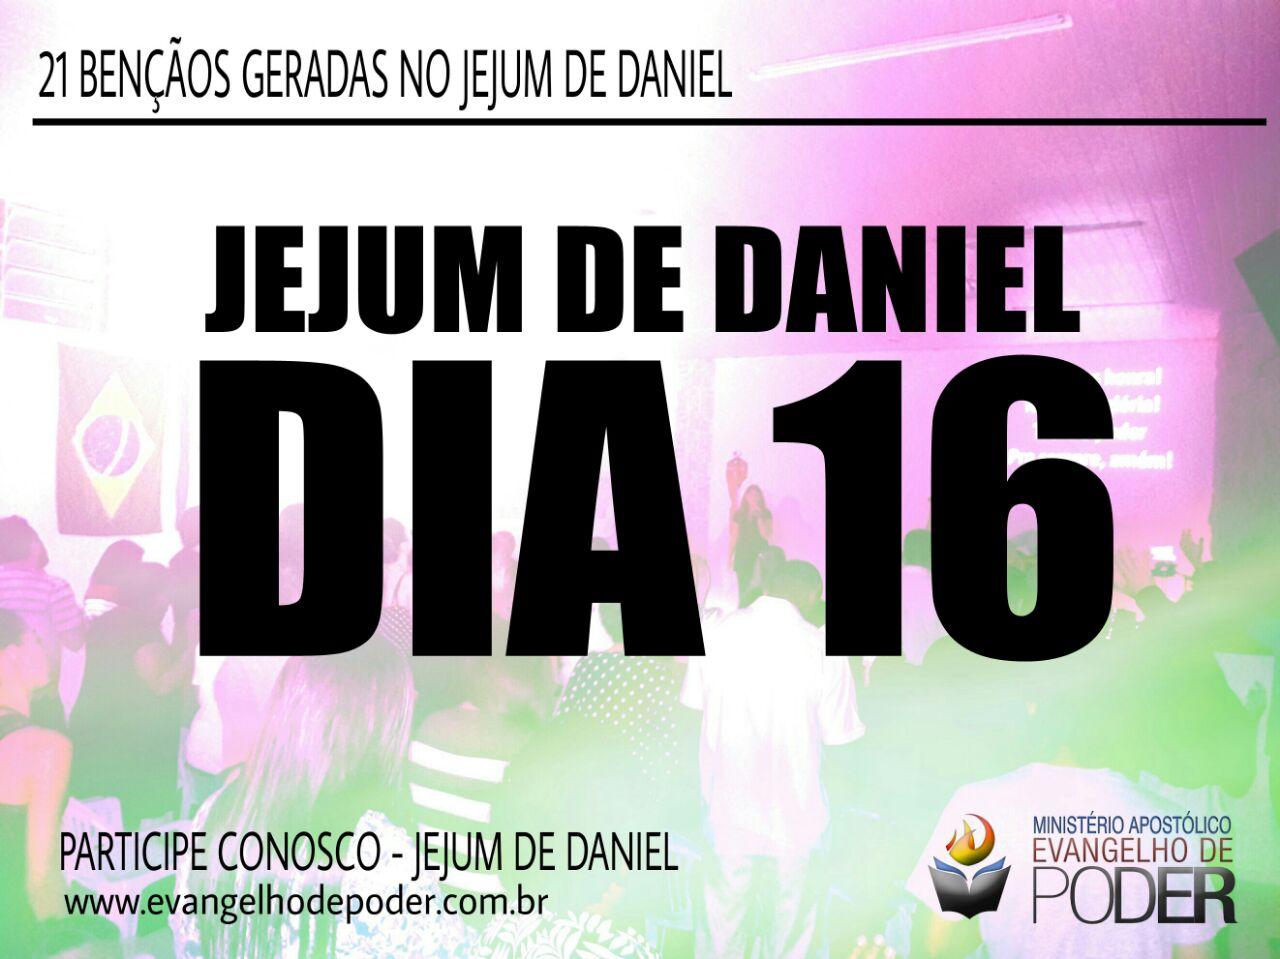 JEJUM DE DANIEL 16° DIA